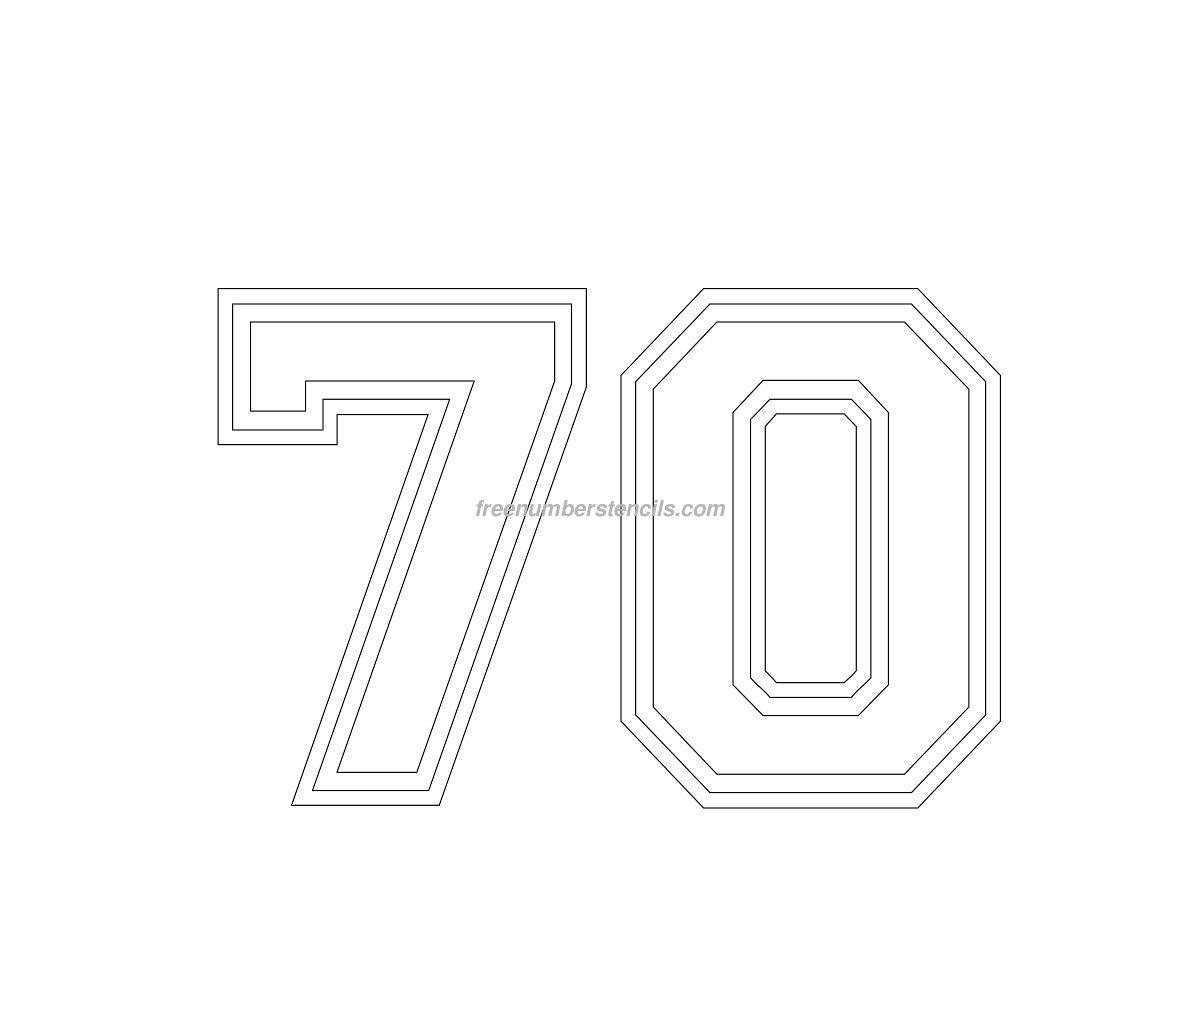 Free Varsity 70 Number Stencil Freenumberstencils Com